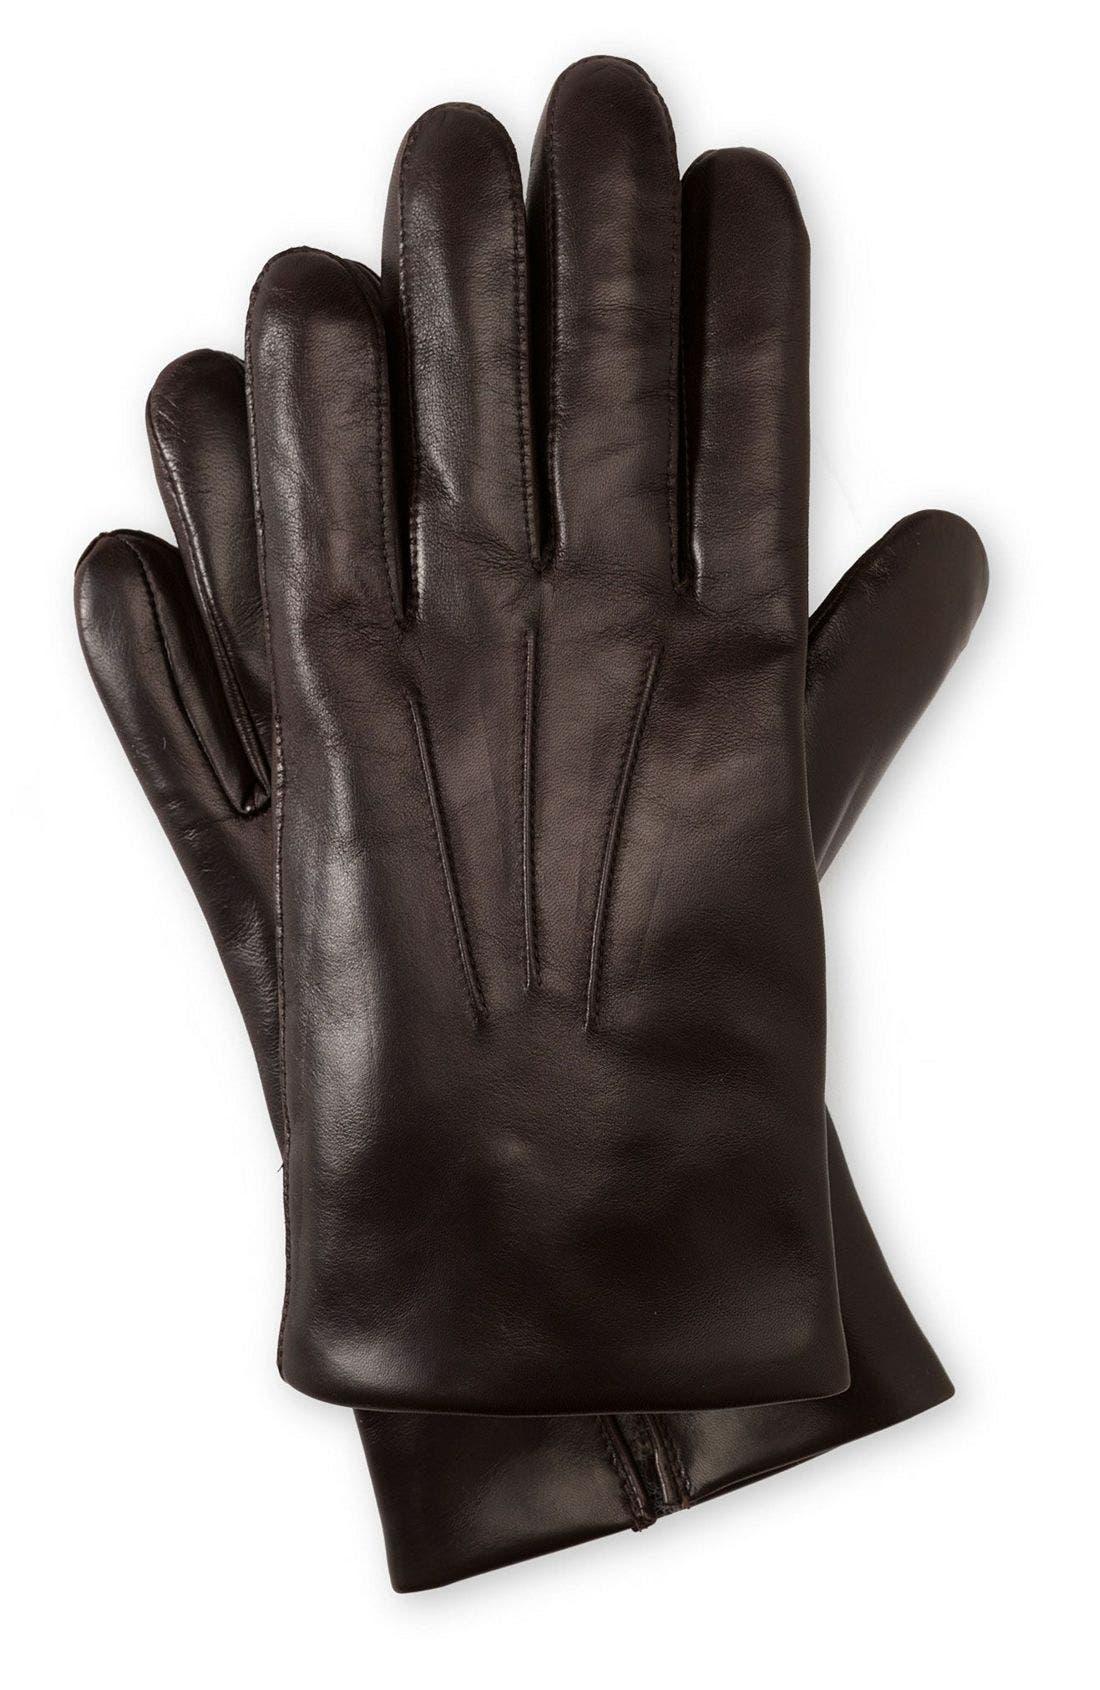 Alternate Image 1 Selected - John W. Nordstrom® Cashmere Lined Leather Gloves